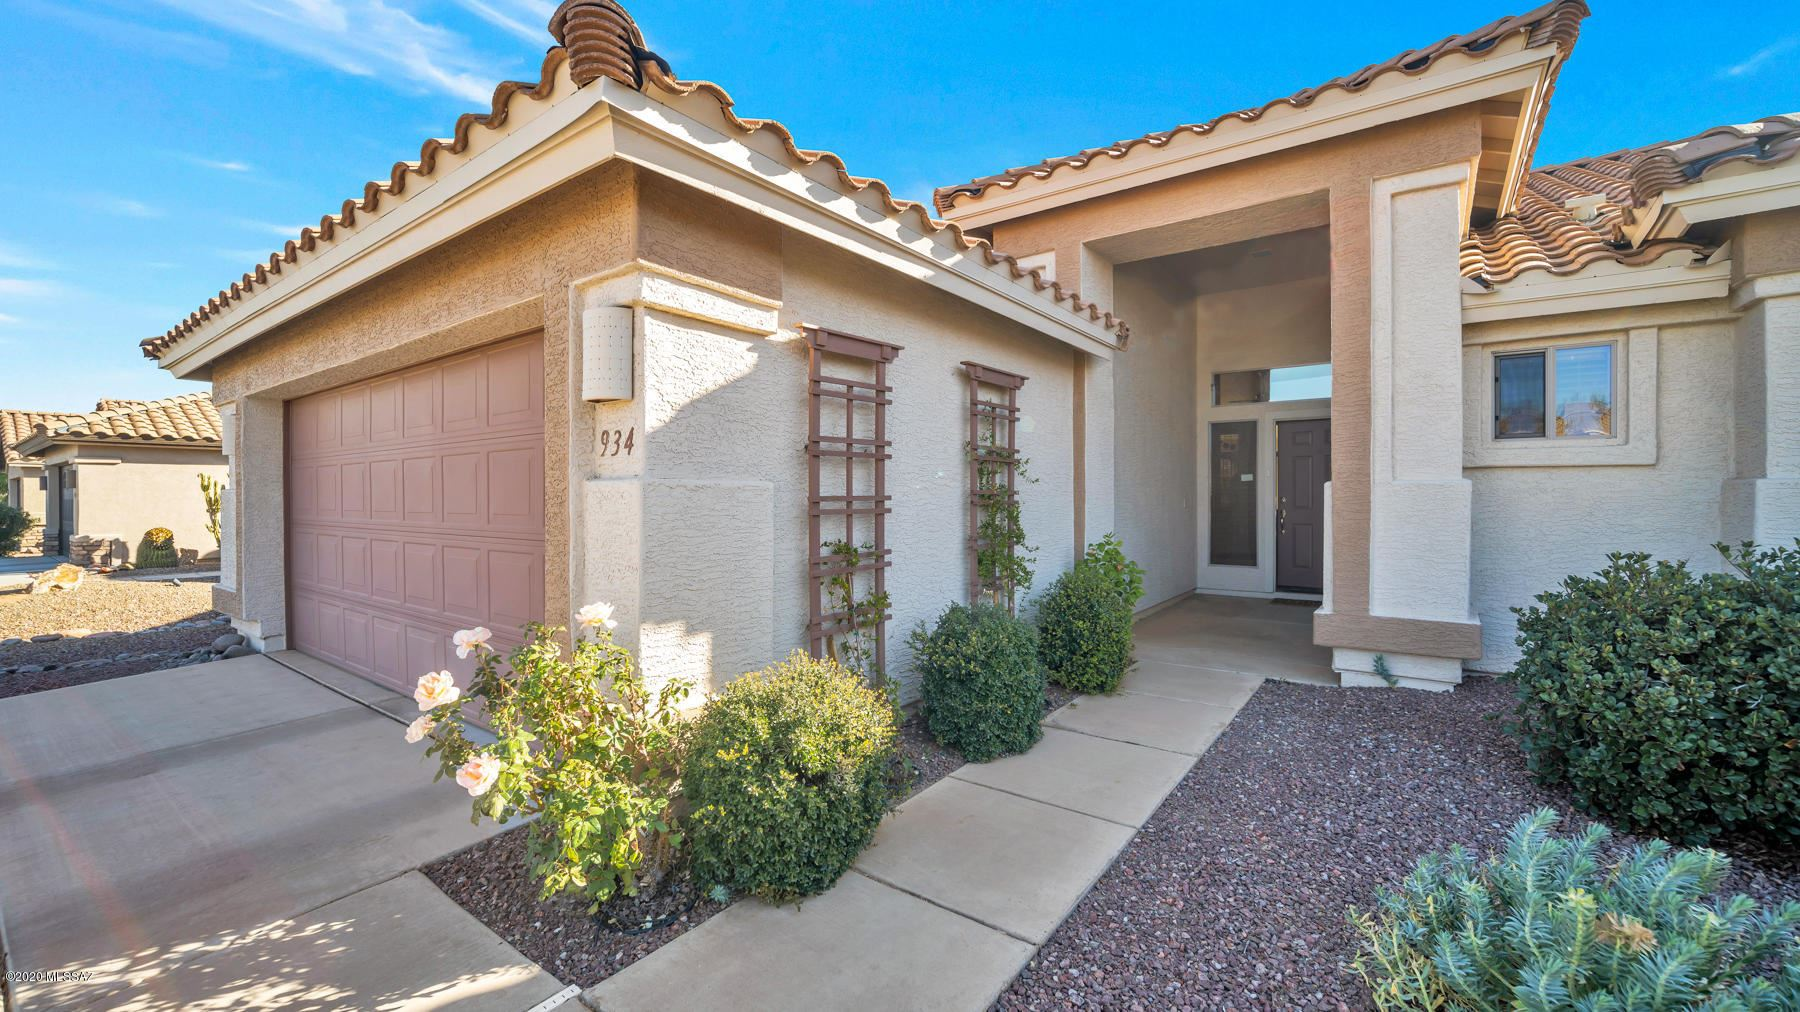 934 N Rhodes Drive, Green Valley, AZ 85614 - MLS#: 22030147